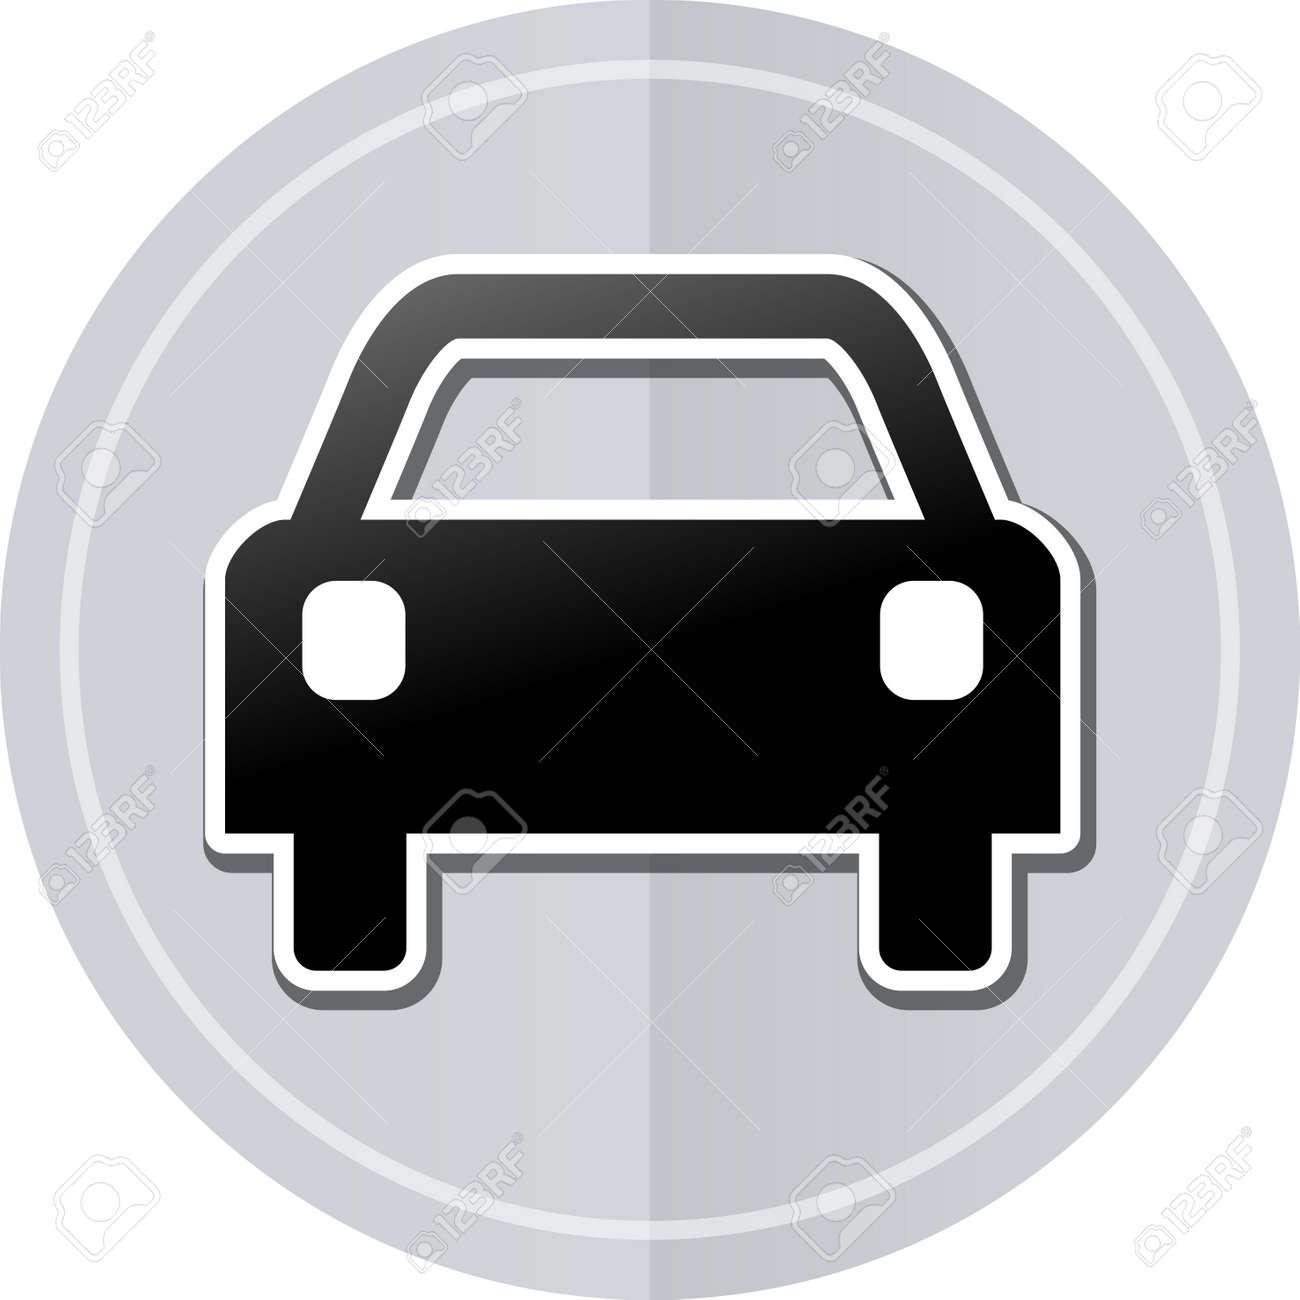 Simple car sticker design - Illustration Of Car Sticker Icon Simple Design Stock Vector 39757704